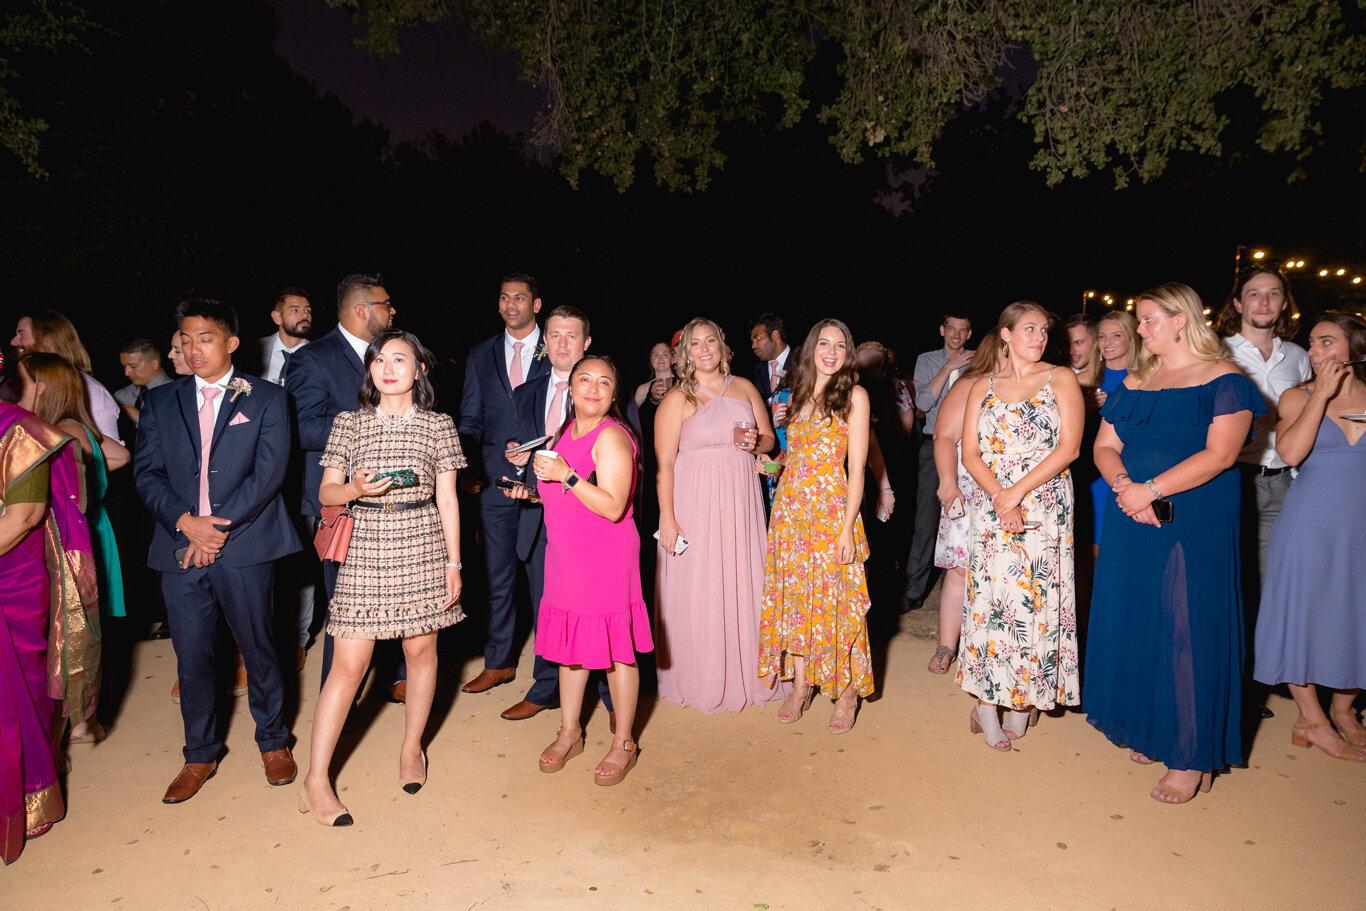 2019.08.24_Emily-Ashir-Wedding-at-the-Maples-6396.jpg